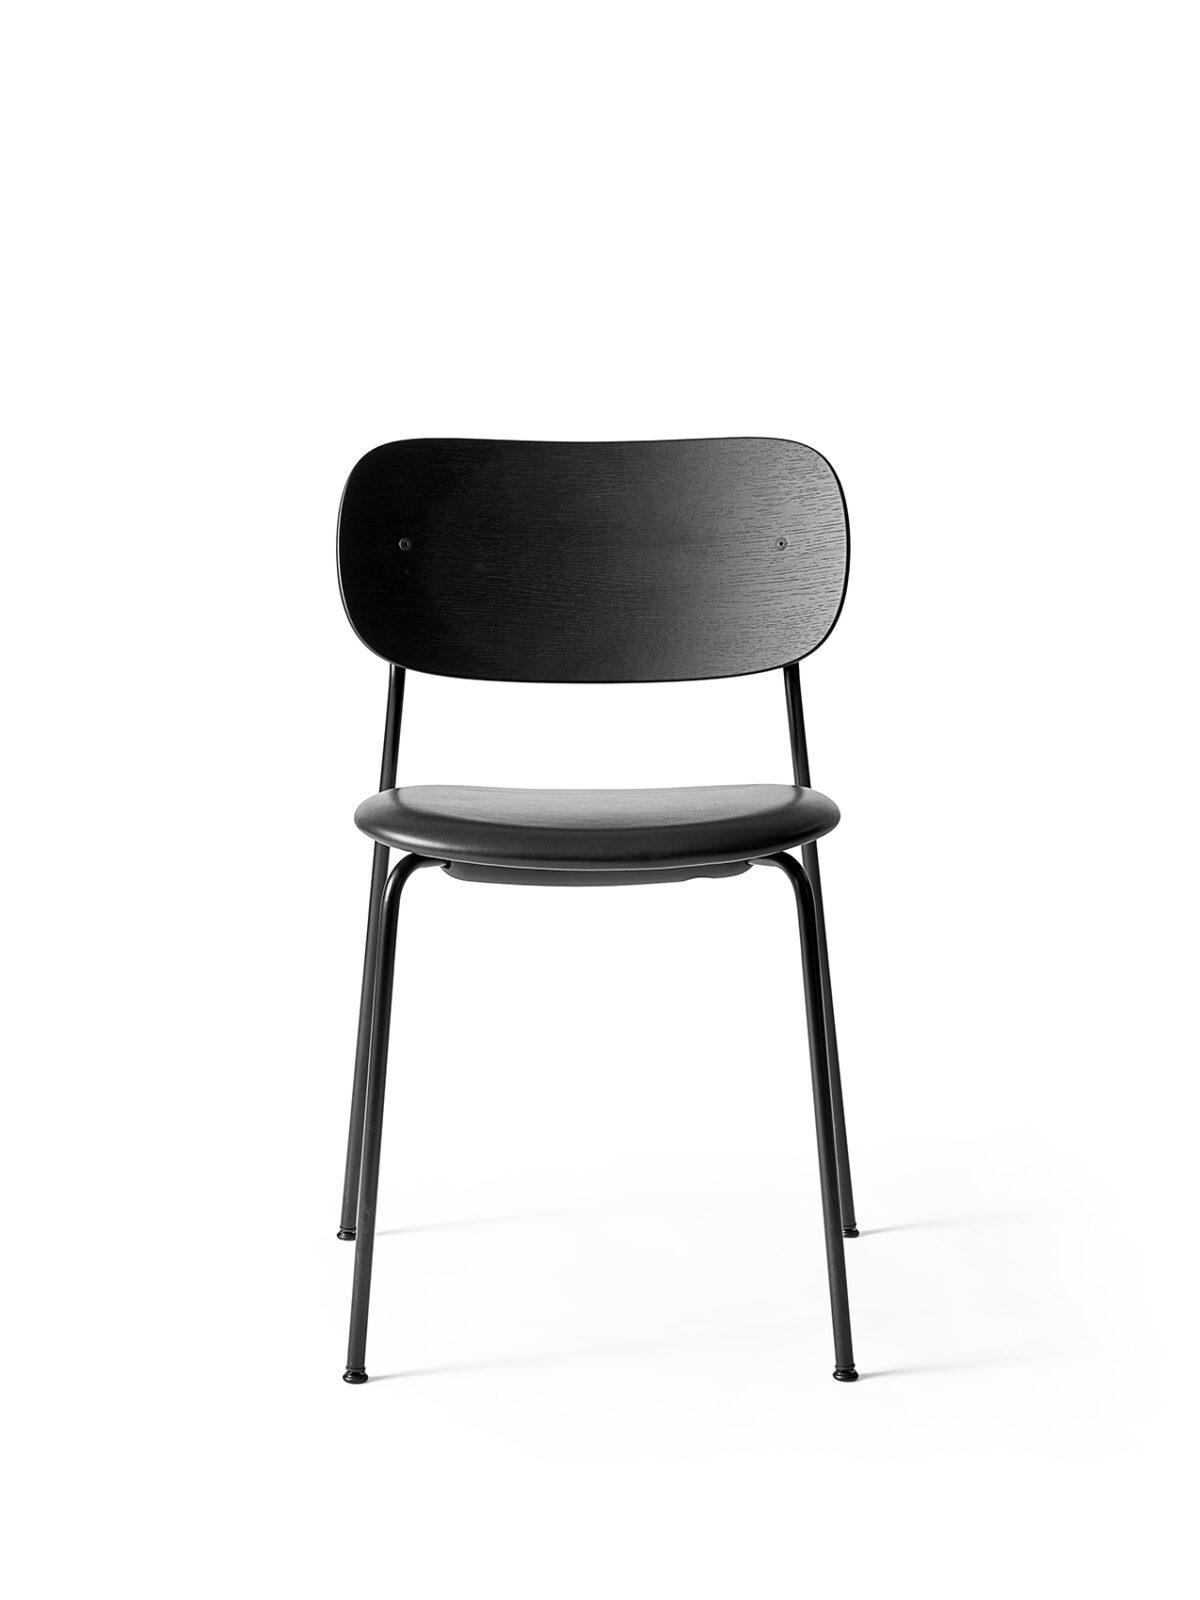 1167539 Co Dining Chair Black Oak Dakar black 0842 front